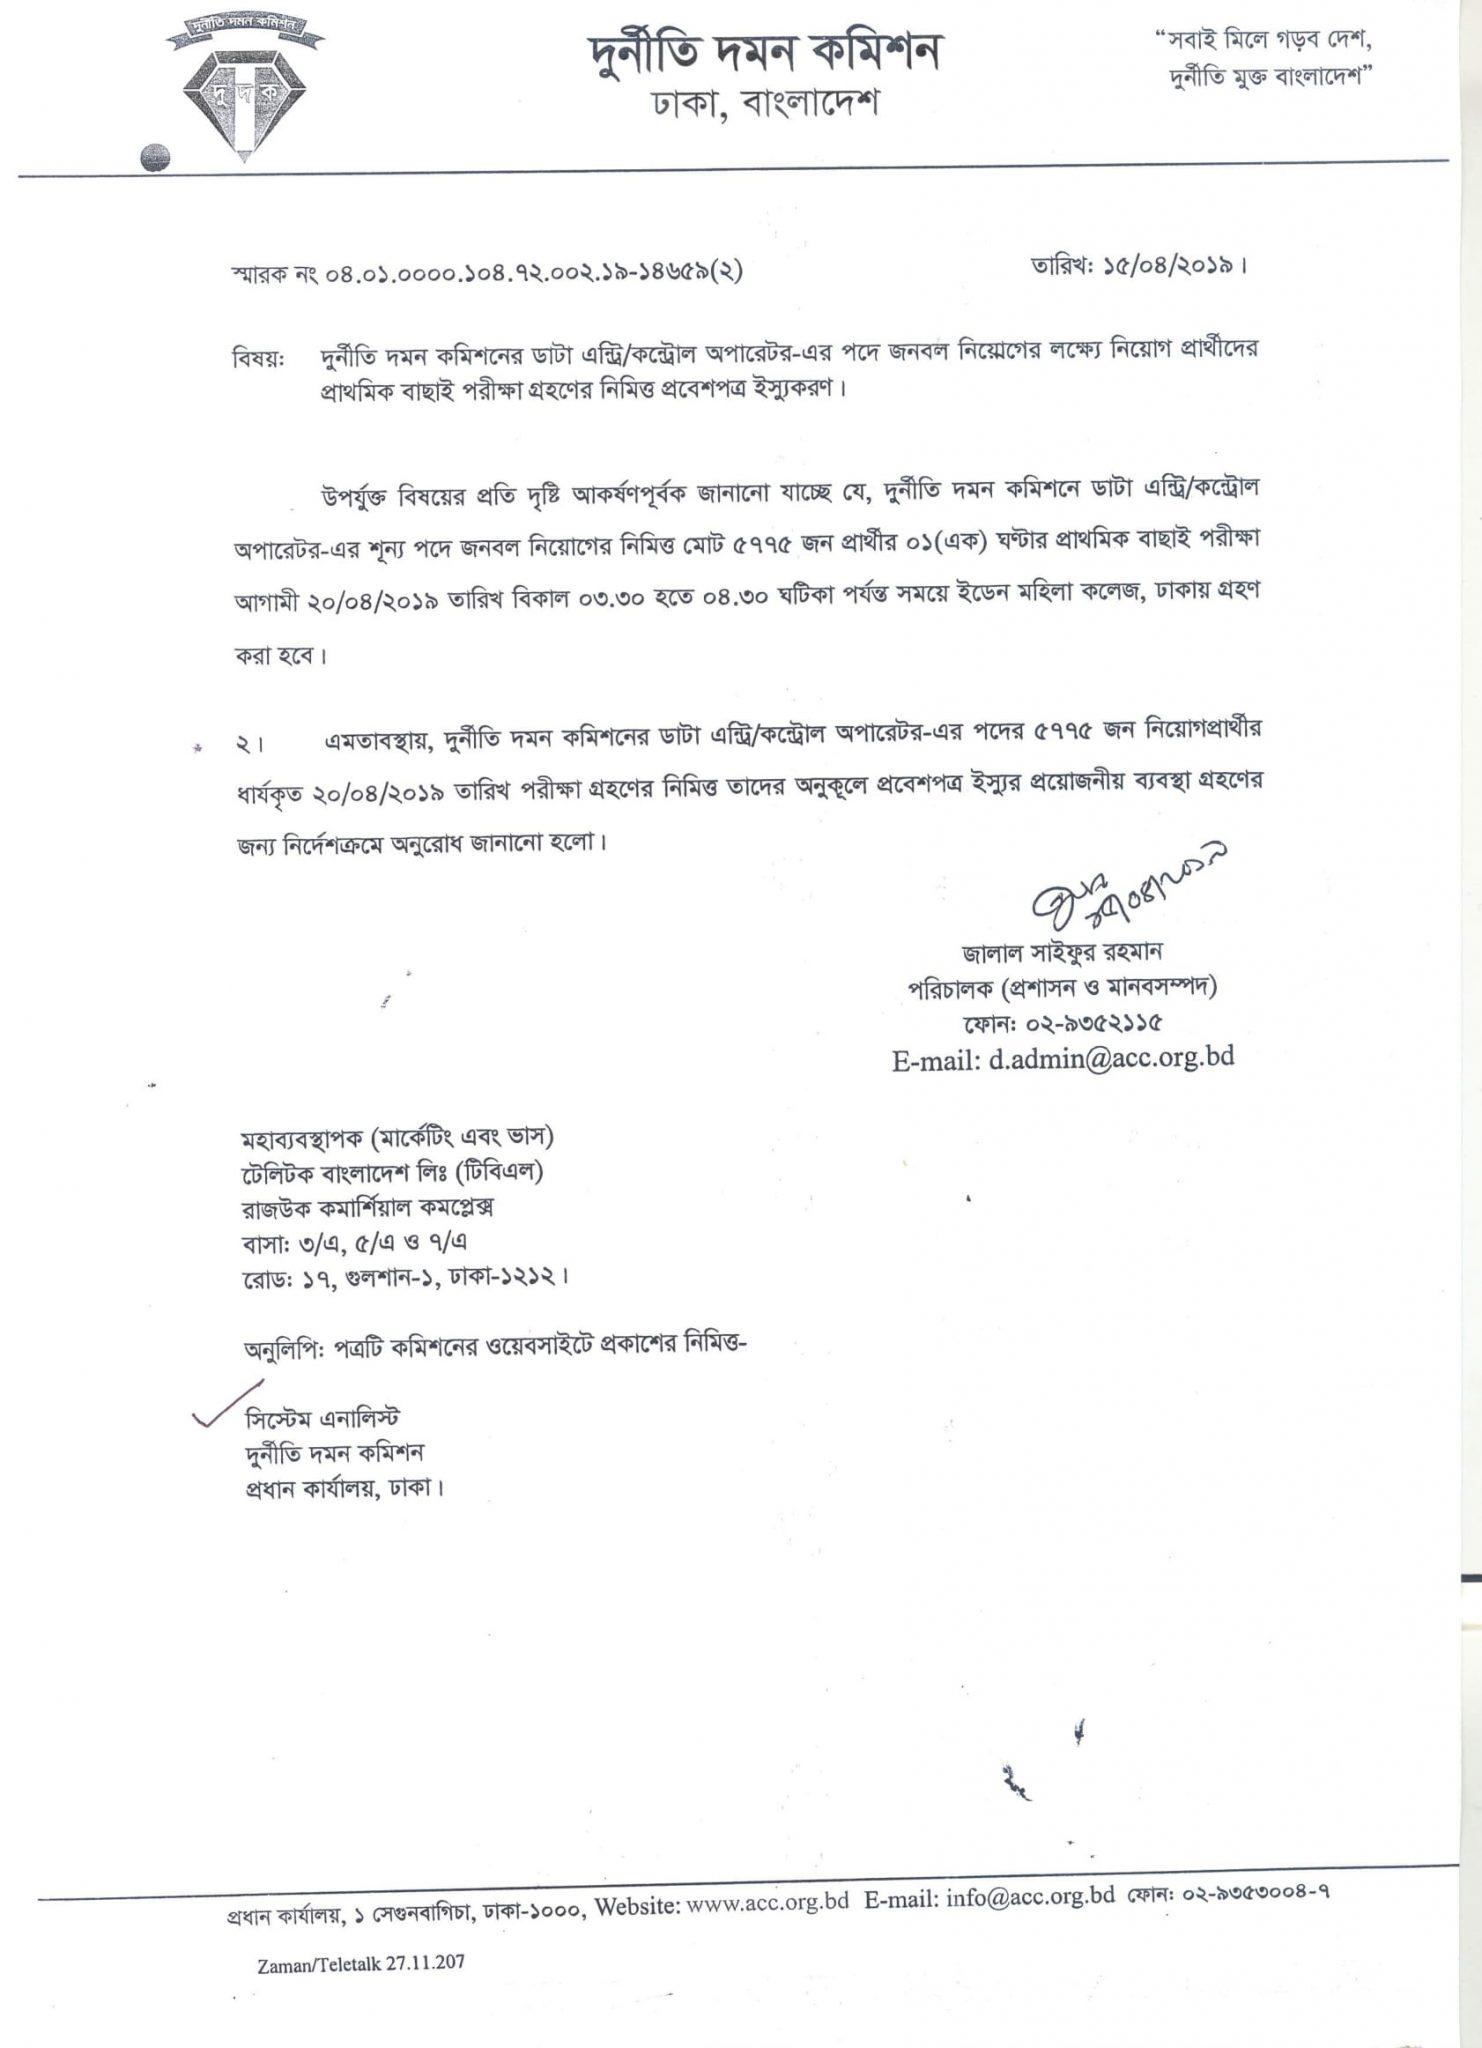 DUDOK-Anti Corruption Commission Job Circular 2019